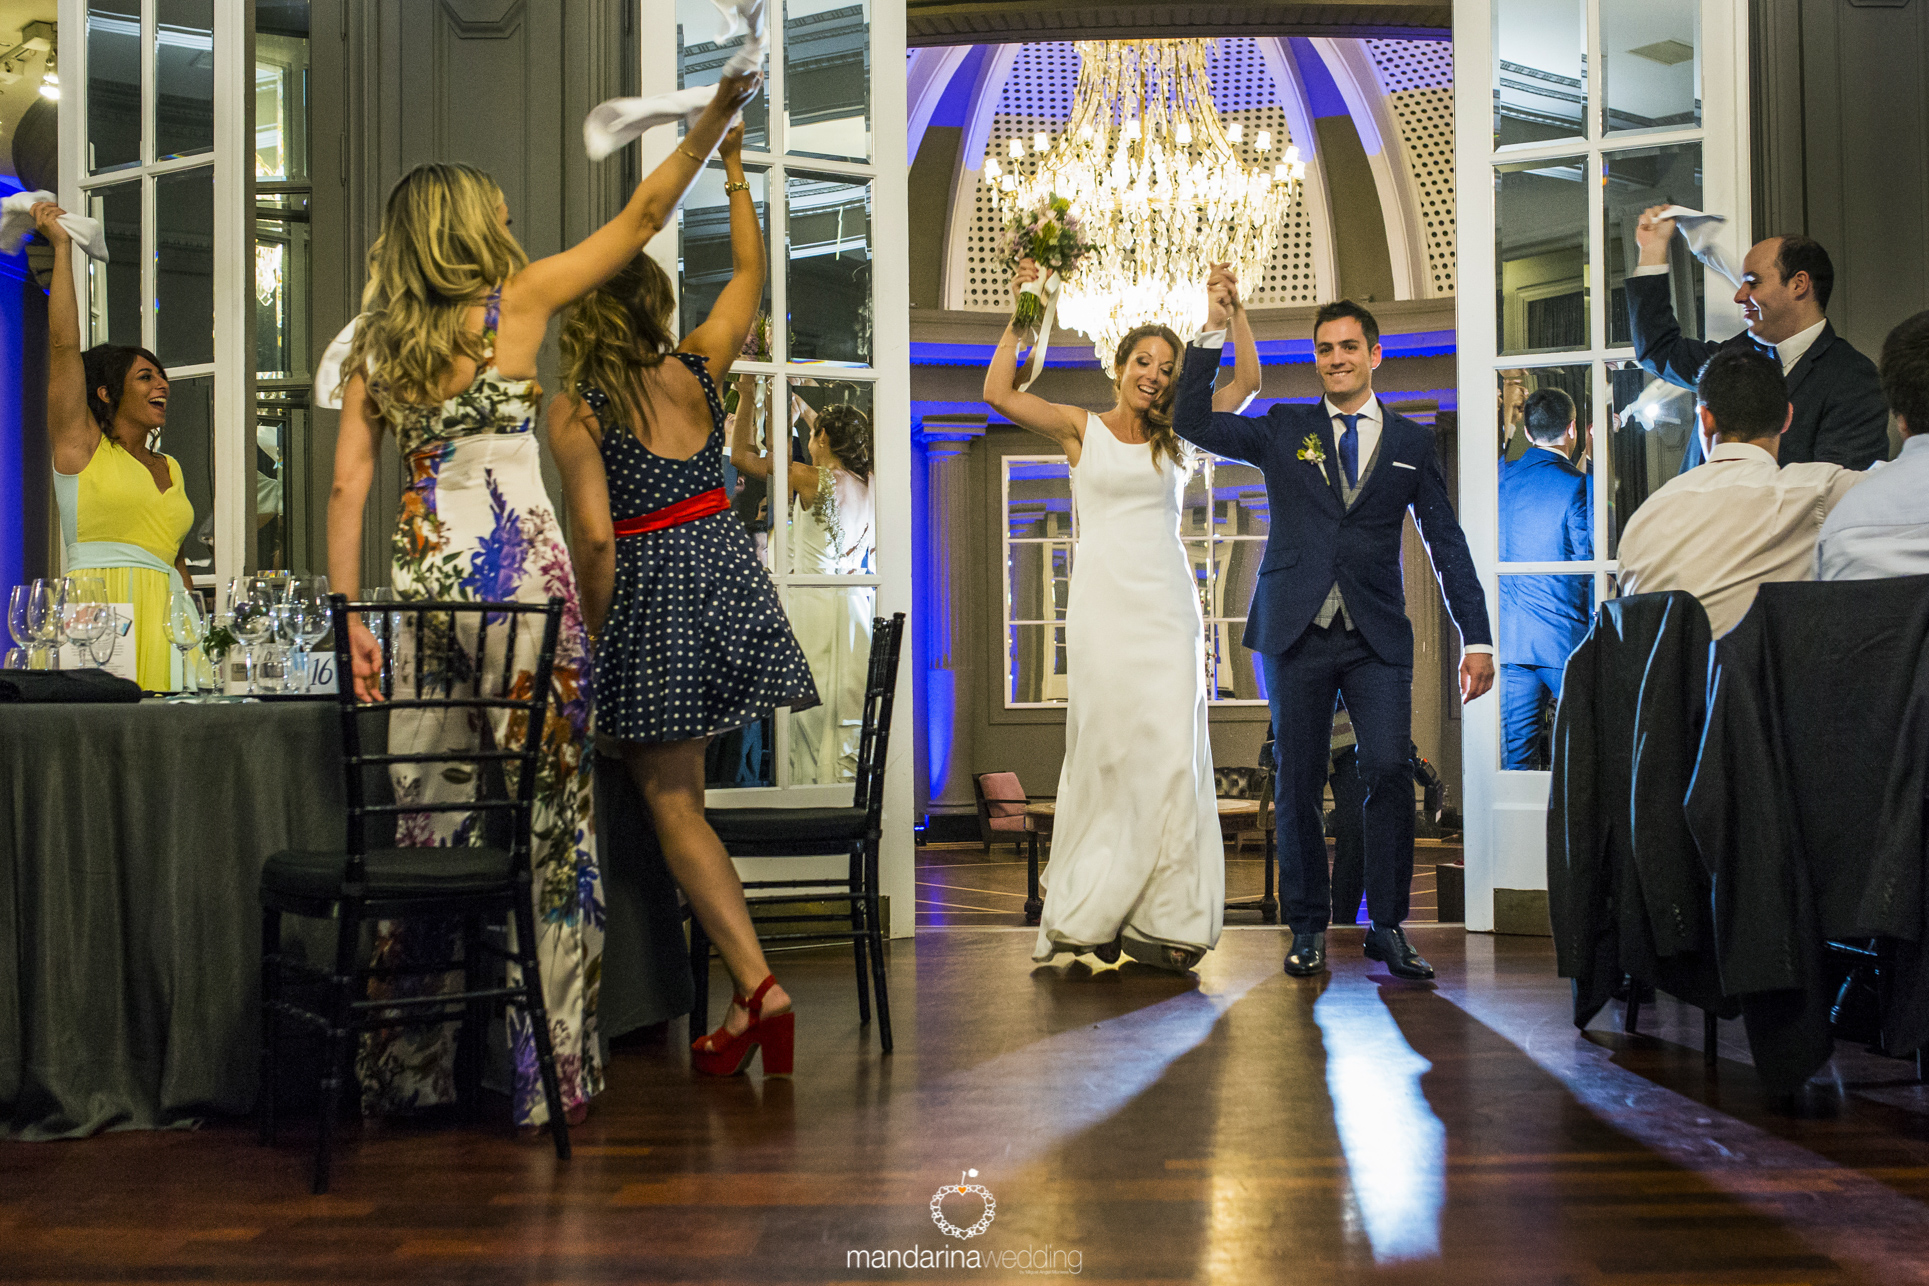 mandarina wedding, fotografo boda pais vasco, fotografo boda zaragoza, fotógrafo boda soria, fotografo boda Madrid, fotógrafo boda tarragona-24